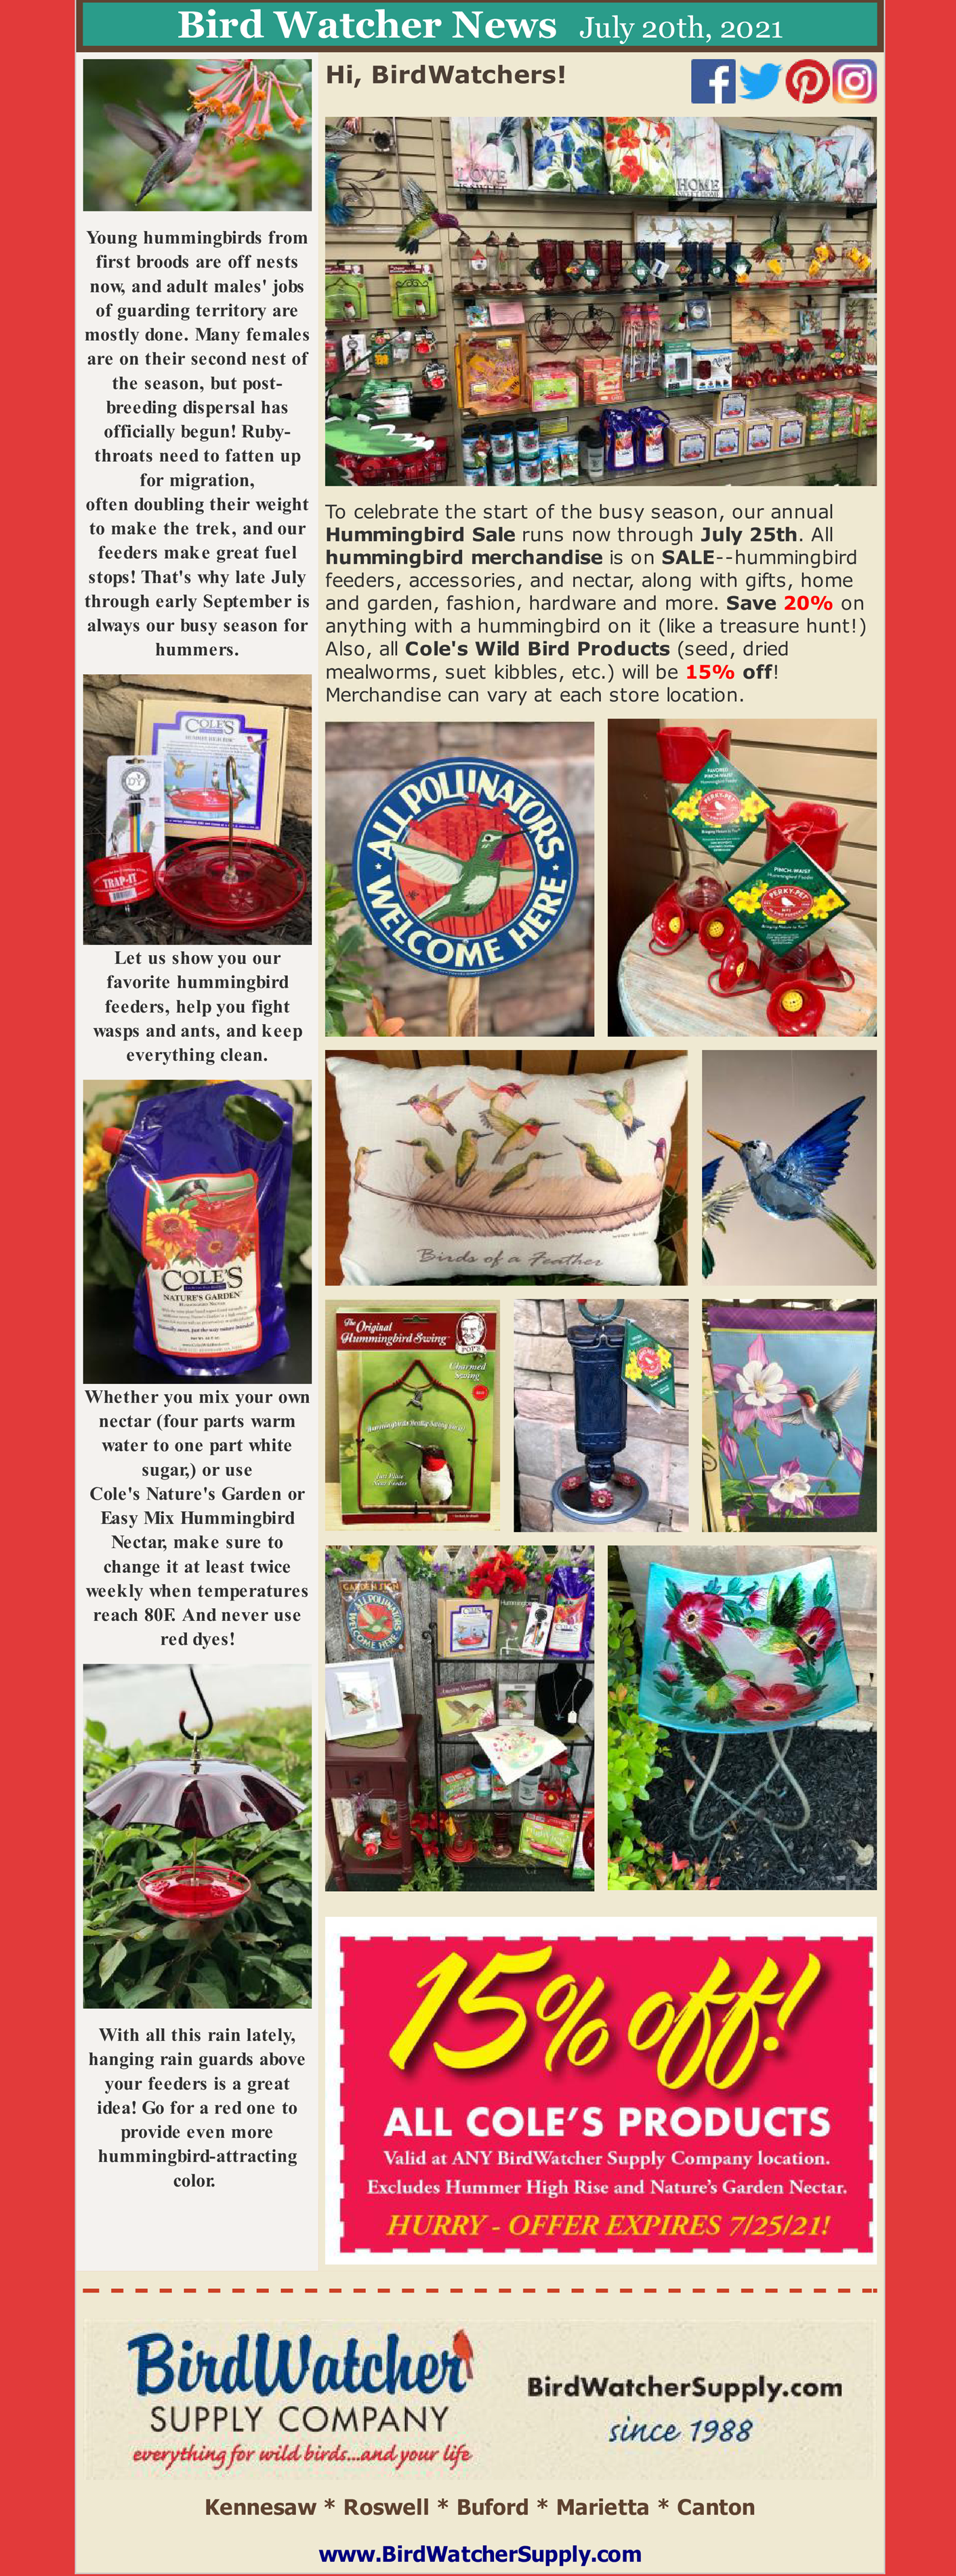 hummingbird, home, garden, sale, pillows, nectar, signs, hummers, feeders, gifts